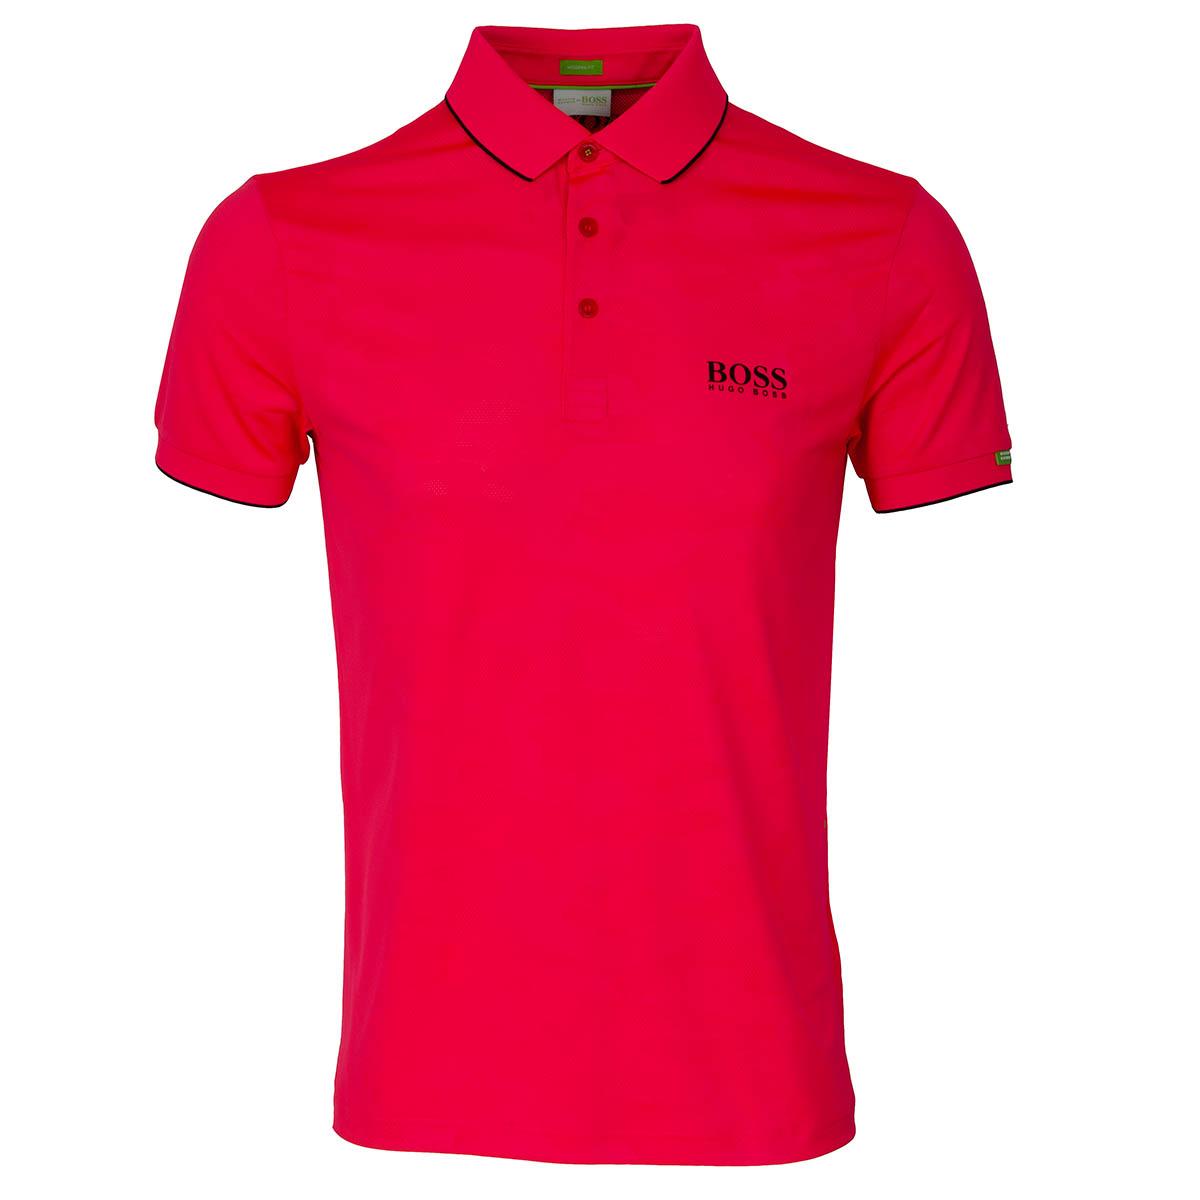 fce0e3087e8e39 BOSS ATHLEISURE Paddy MK 2 Polo Shirt Bright Pink | Scottsdale Golf